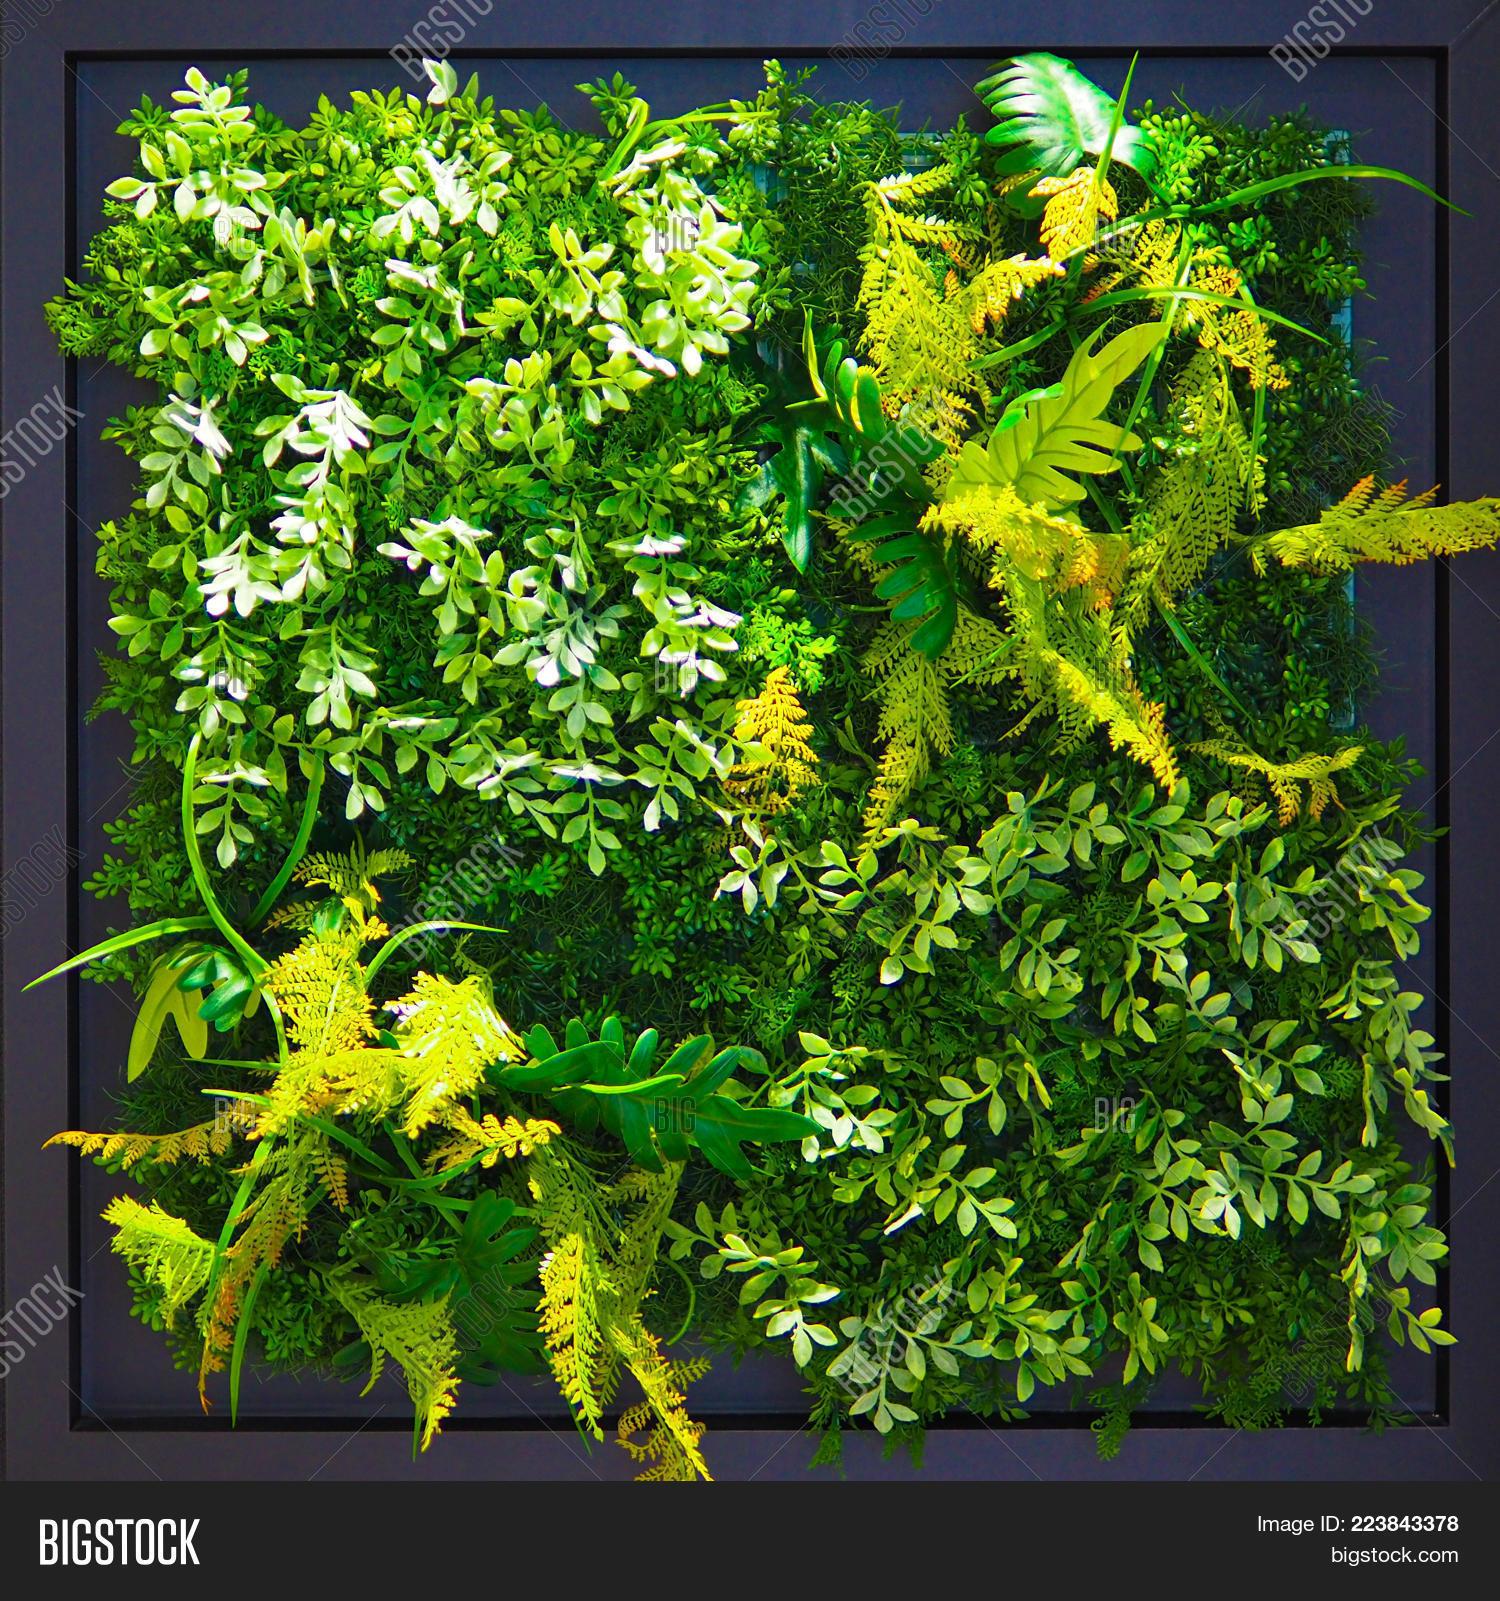 Vibrant Green Foliage Image Photo Free Trial Bigstock